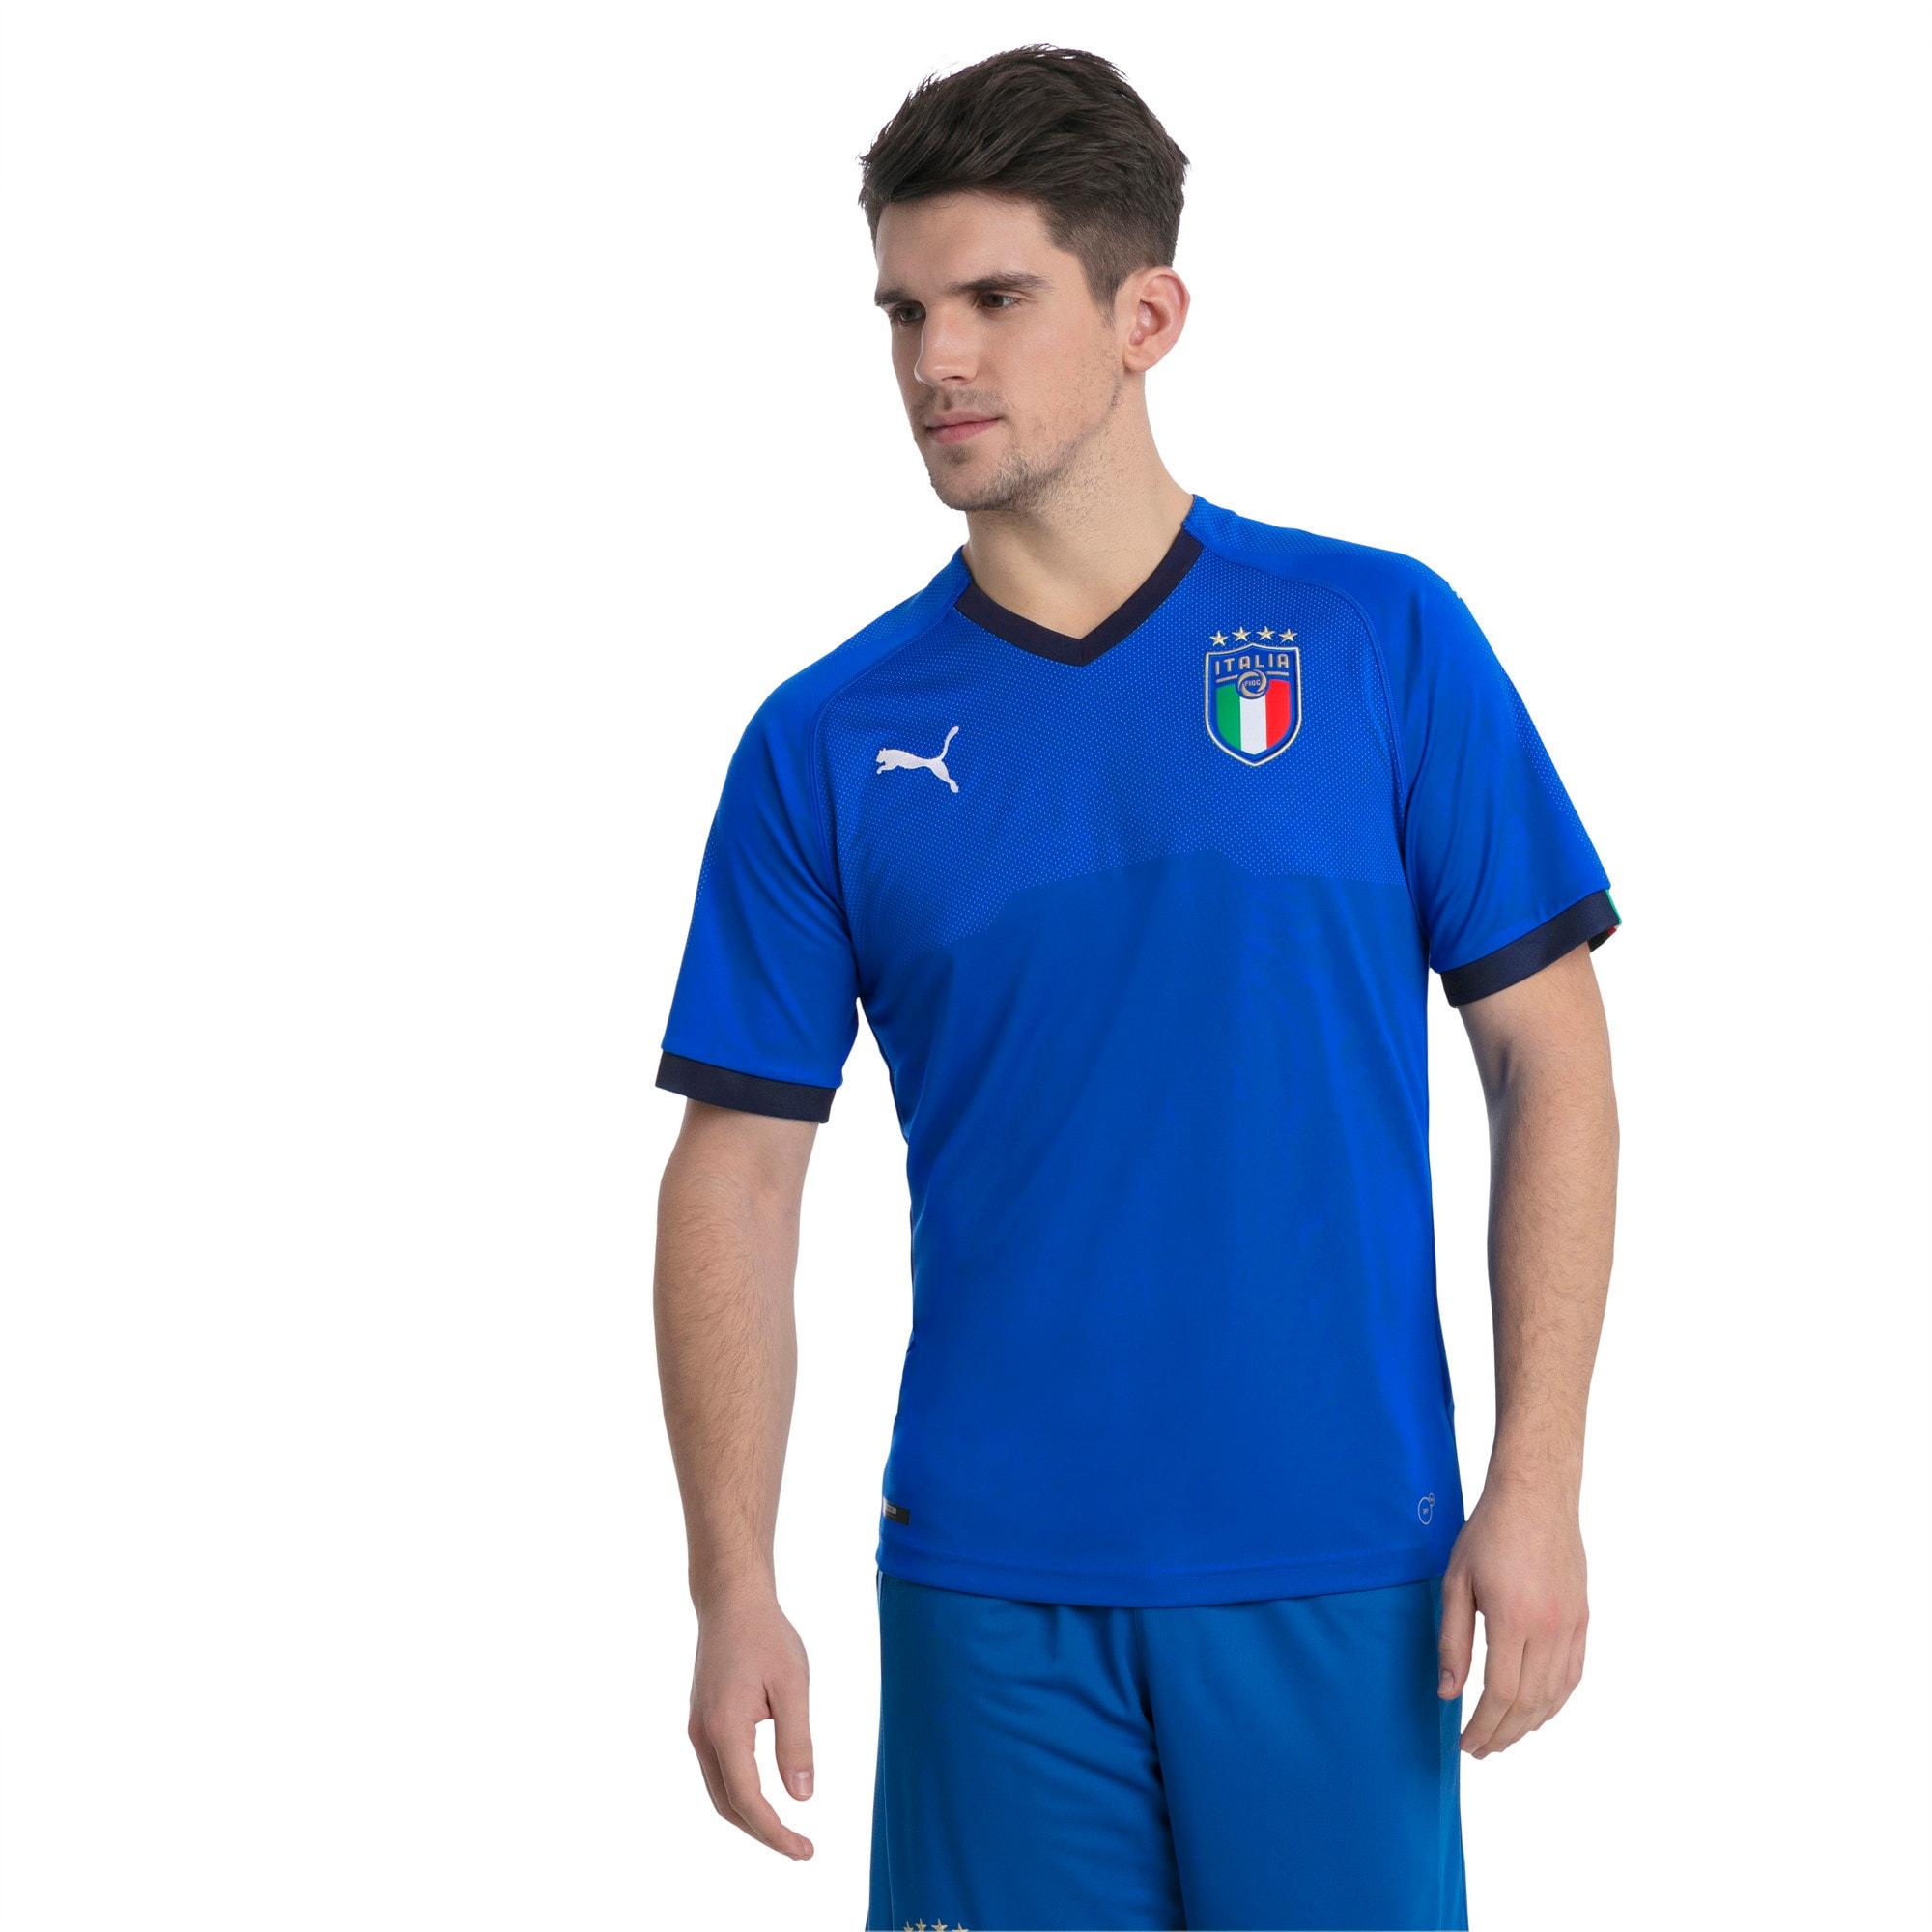 Thumbnail 1 of FIGC ITALIA HOME SHIRT REPLICA, Team Power Blue-Peacoat, medium-JPN